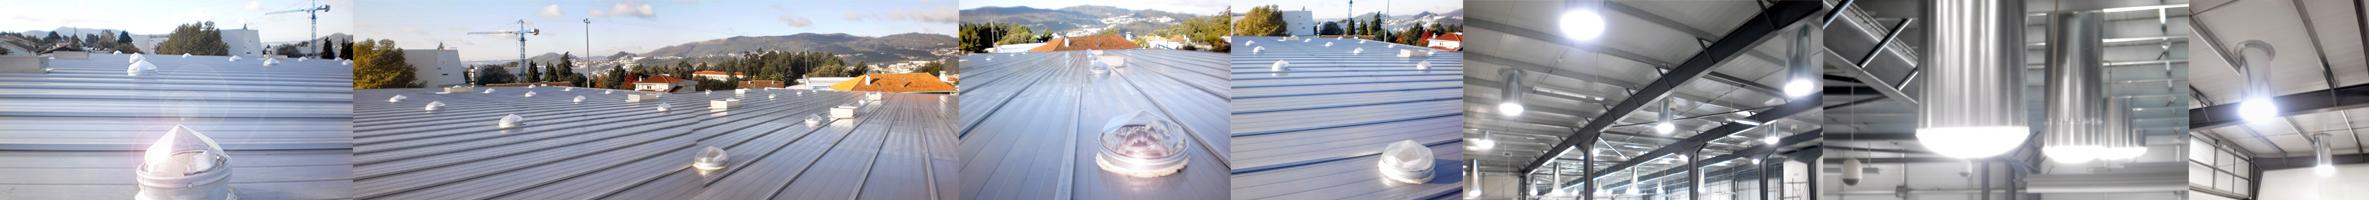 tubo_solar_chatron_industrial